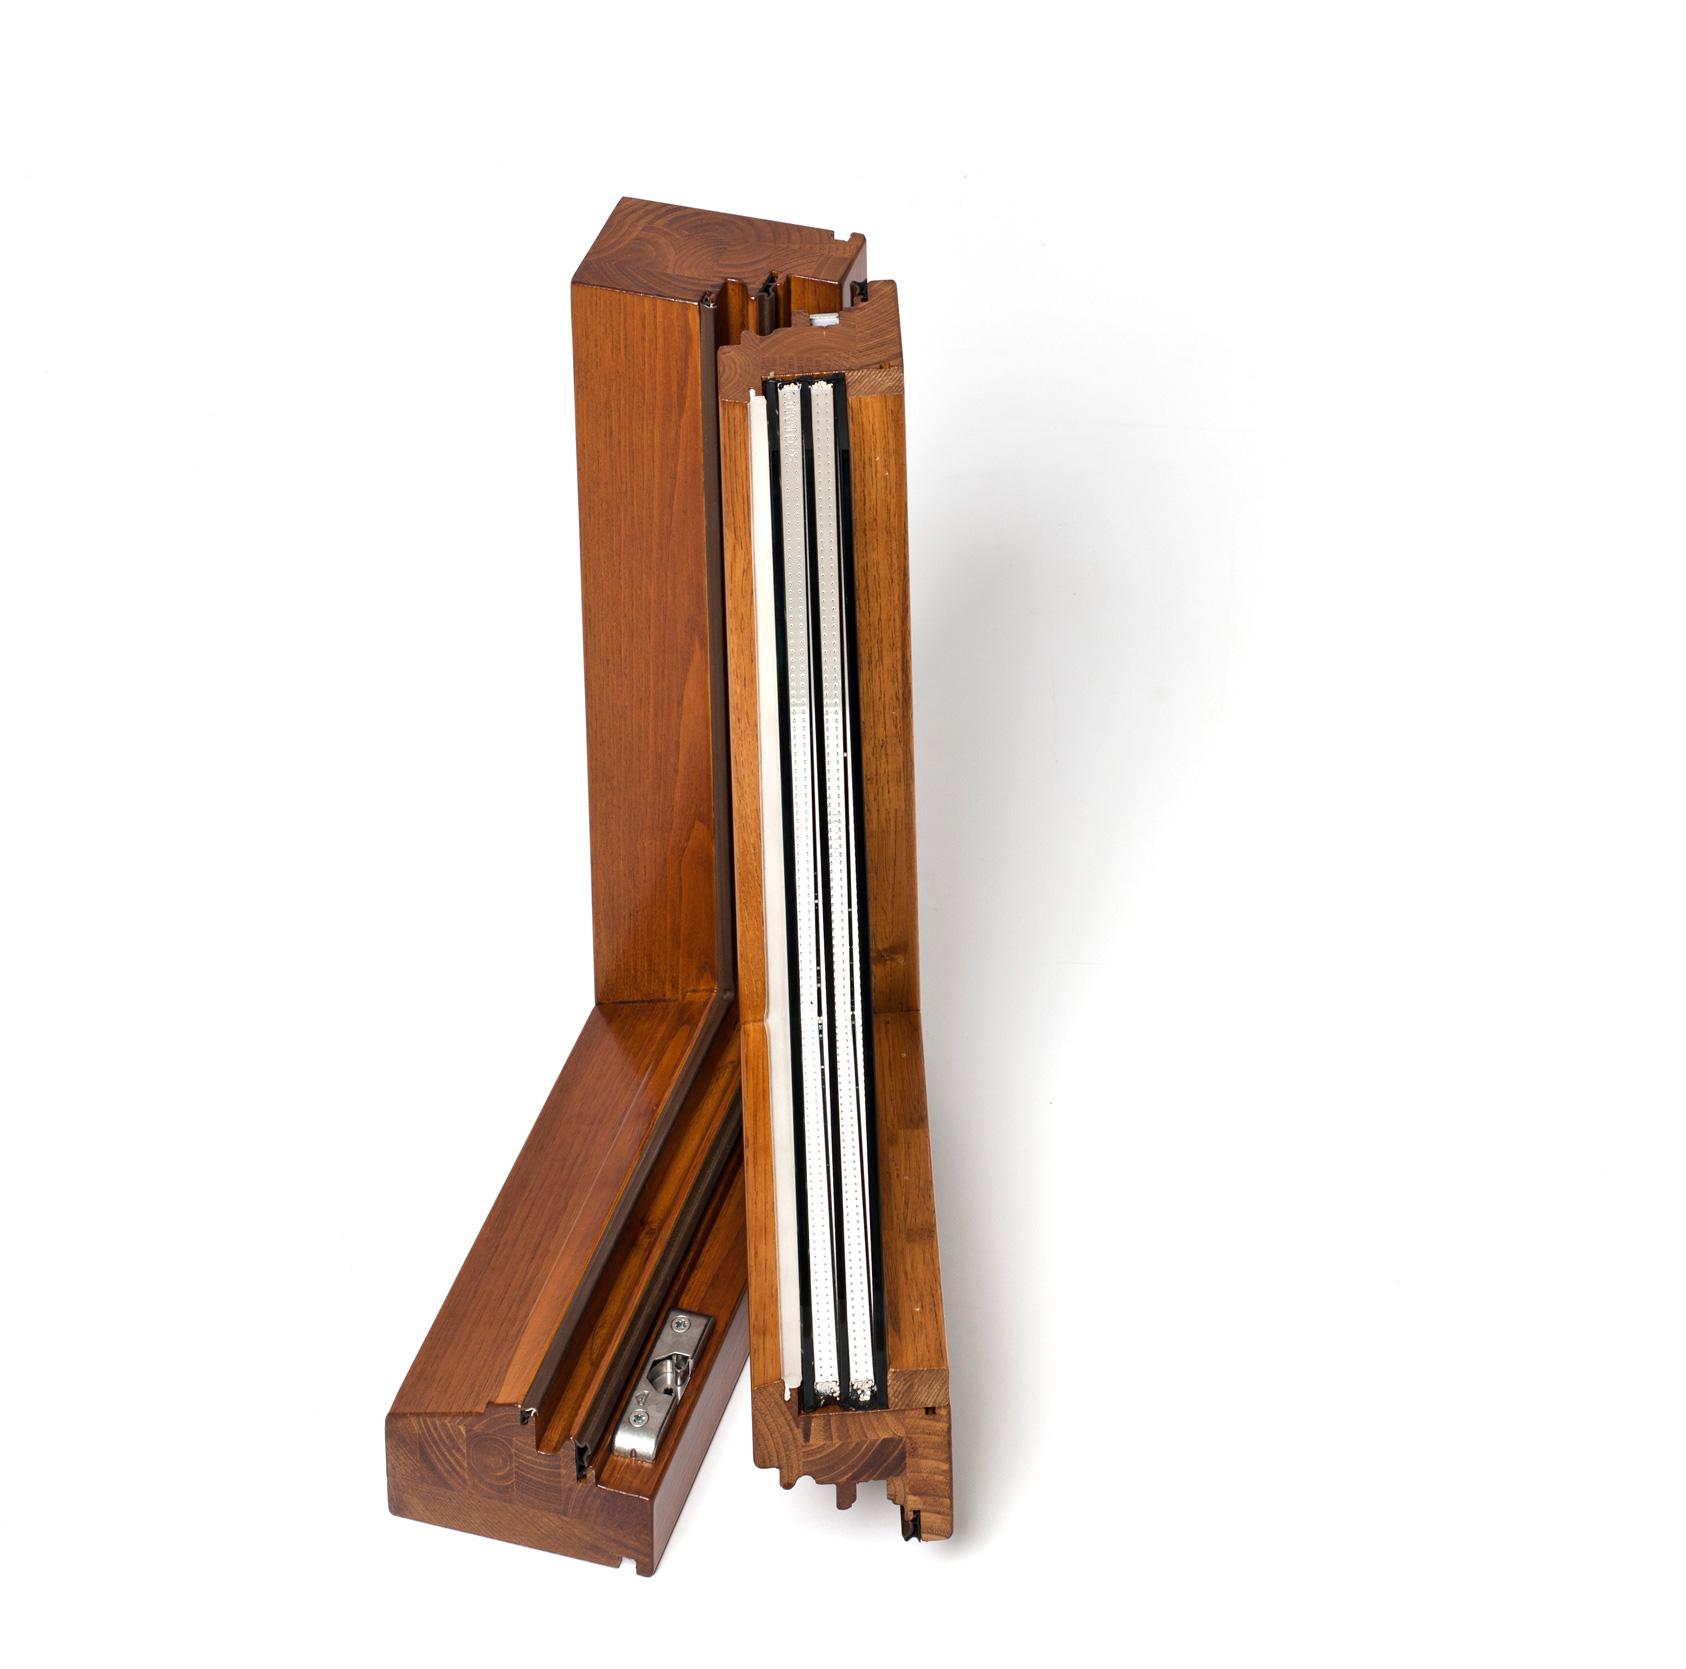 Modelos de ventanas de madera finest curva ver modelo for Ver modelos de puertas de madera